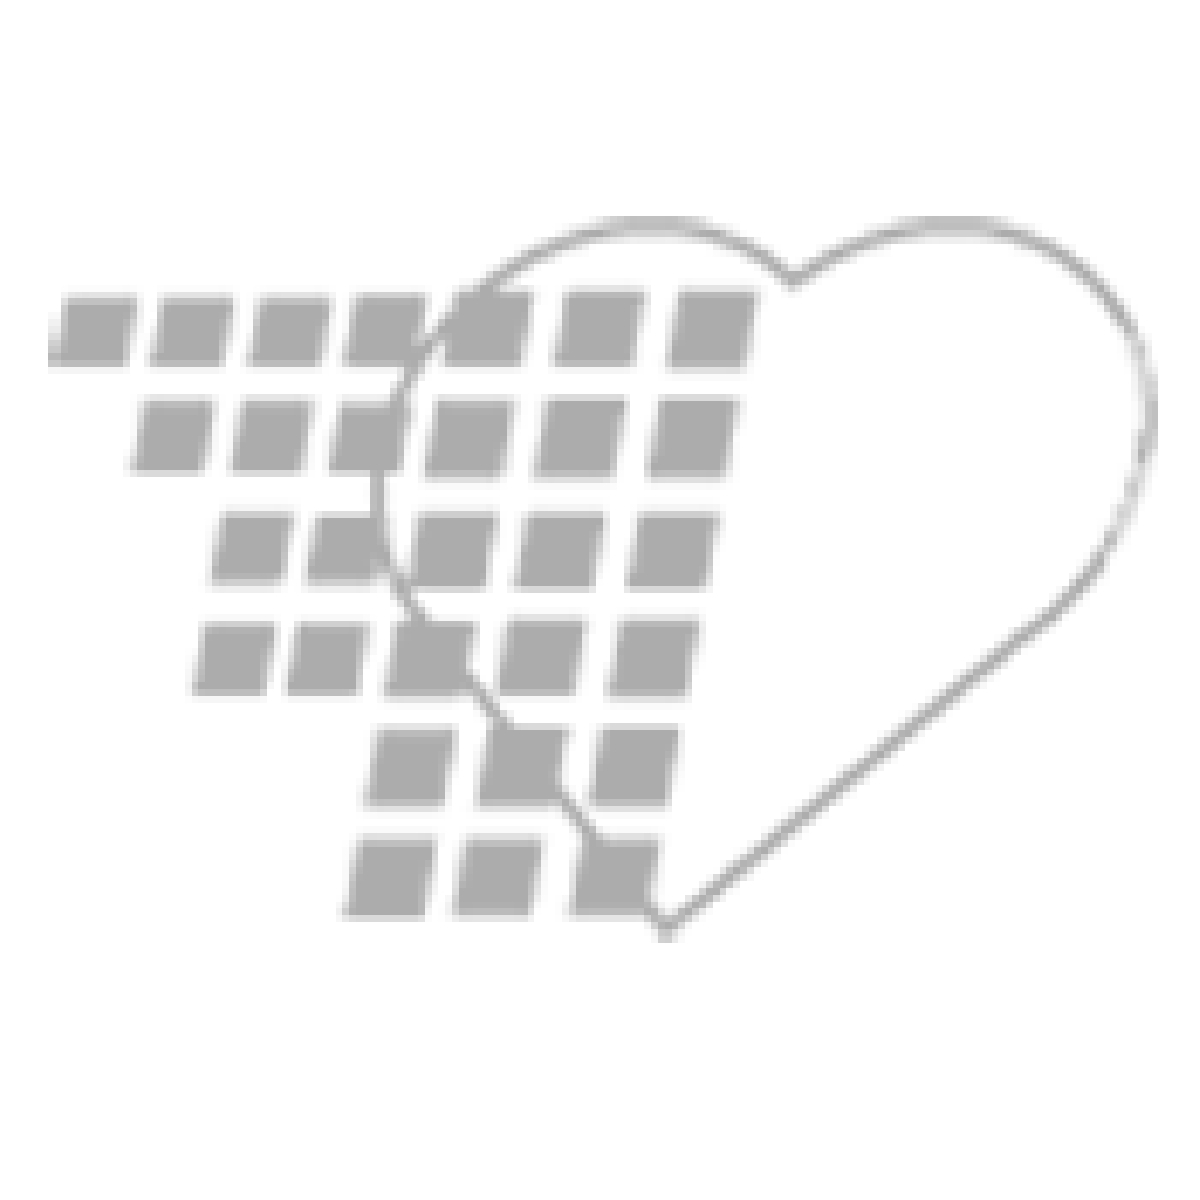 06-93-0314 - Demo Dose® Long Term Potassim 20 mEq Medication Pack